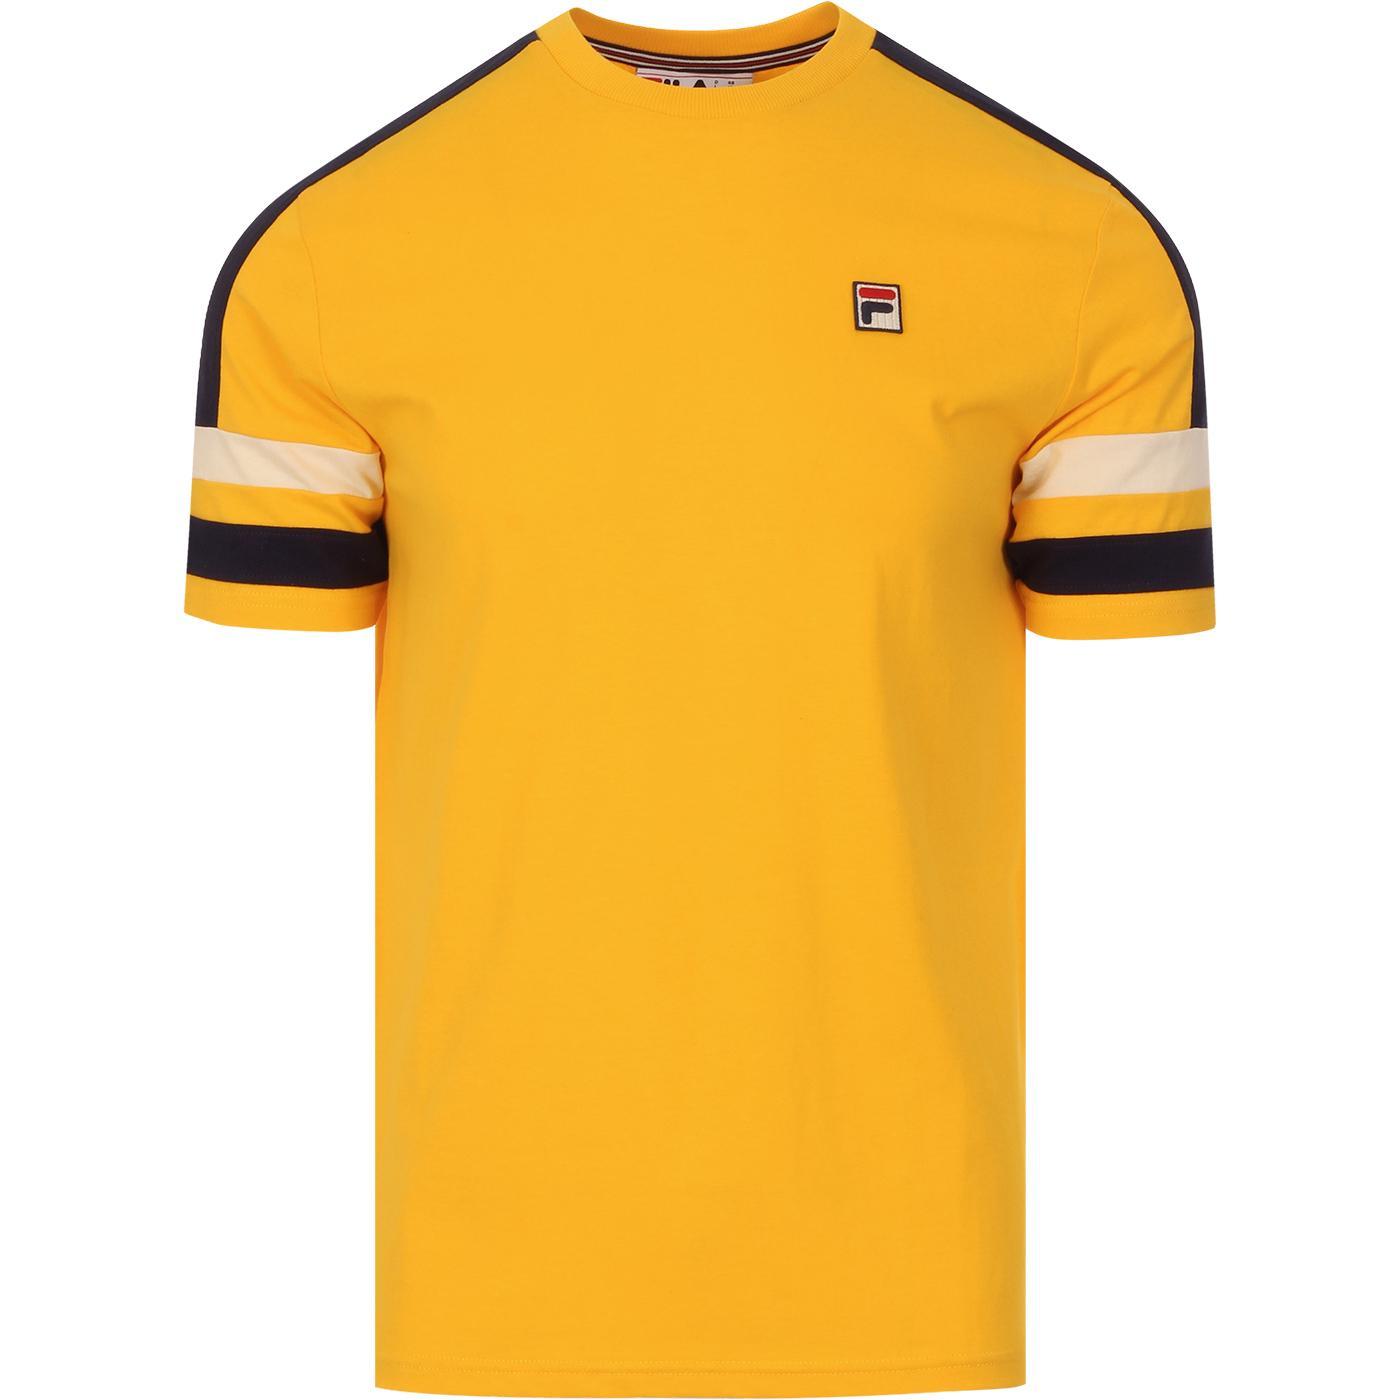 Juan FILA VINTAGE Retro 70s Sports T-Shirt YELLOW